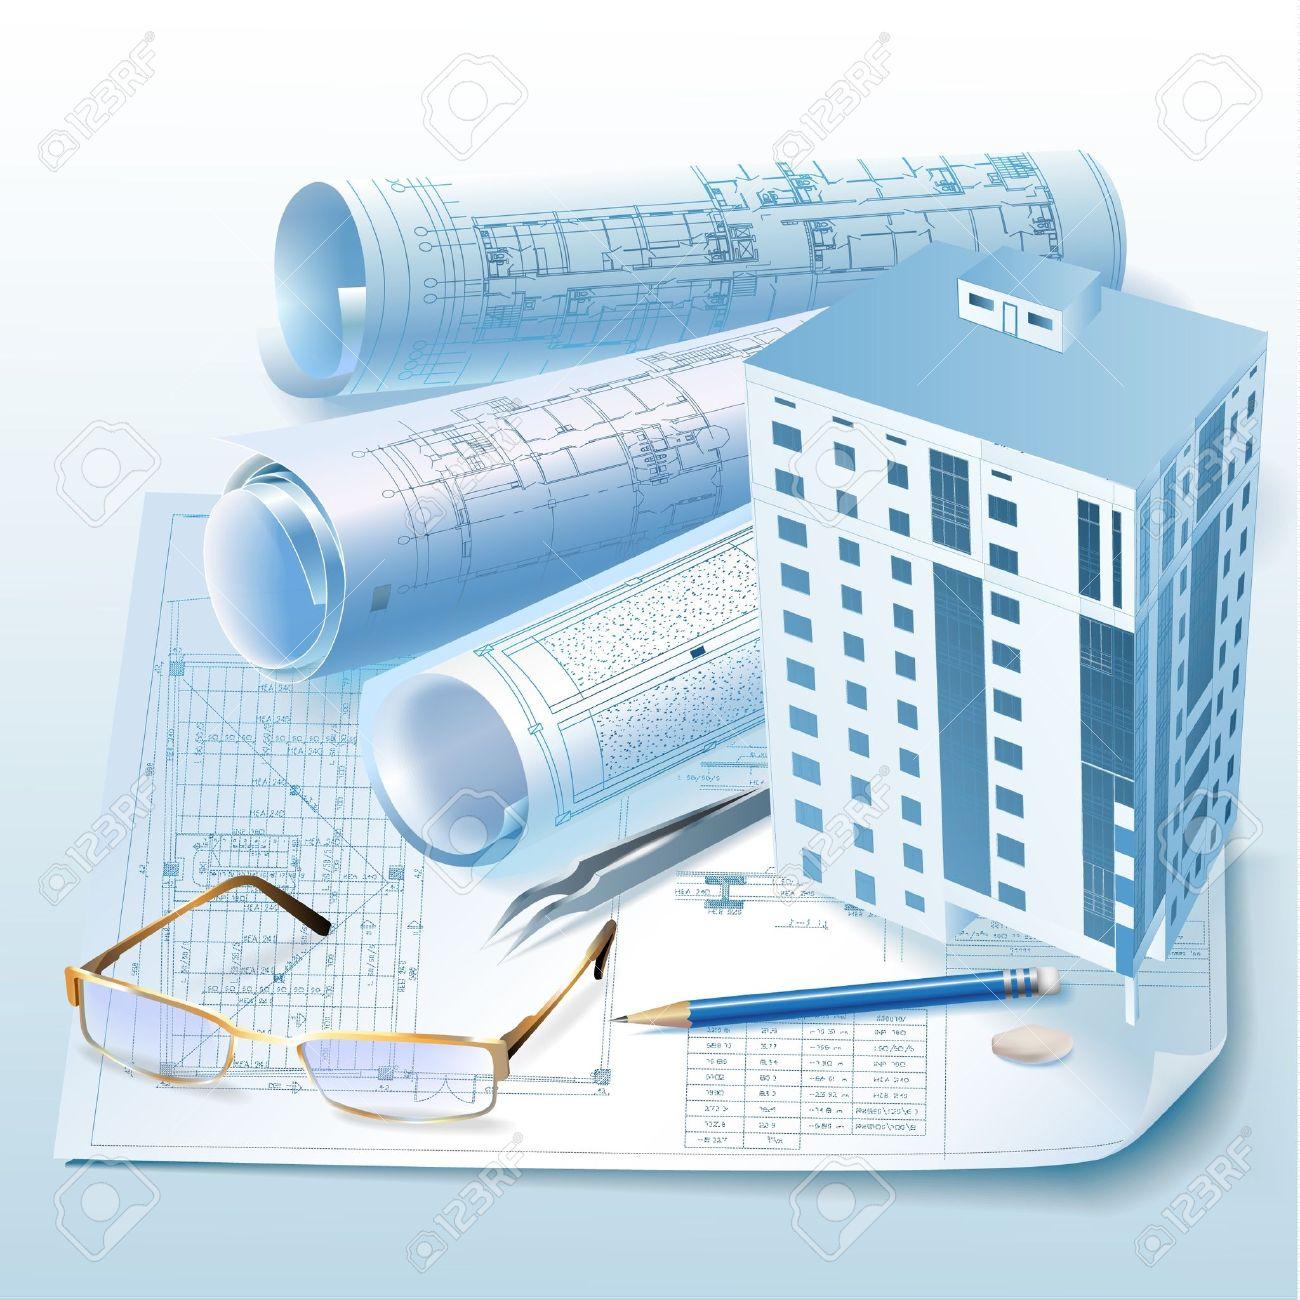 Architecture Blueprints 3d architectural background with a 3d building model clip-art royalty